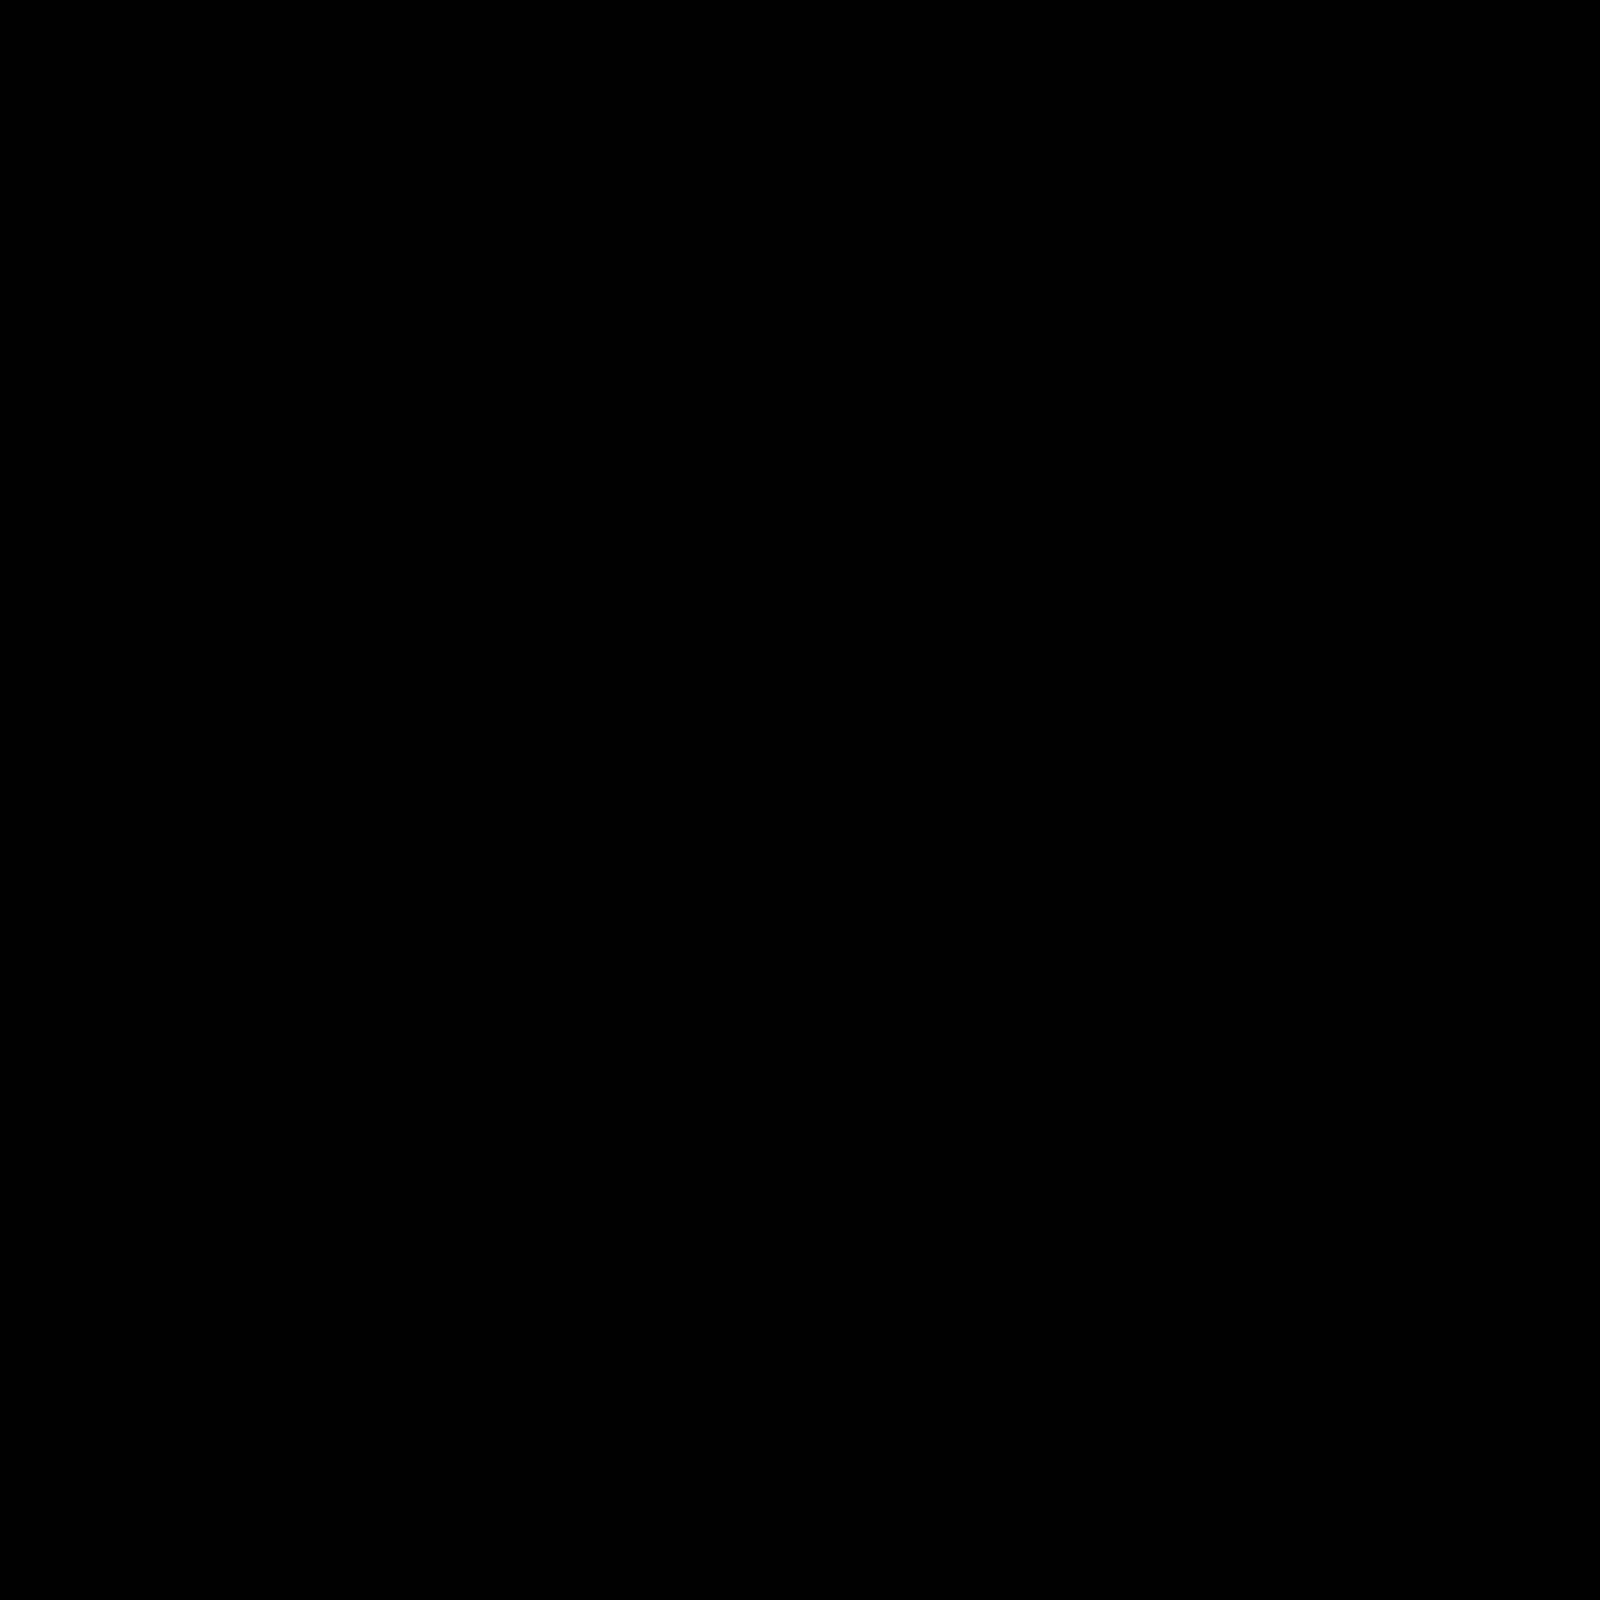 Alarm off icon